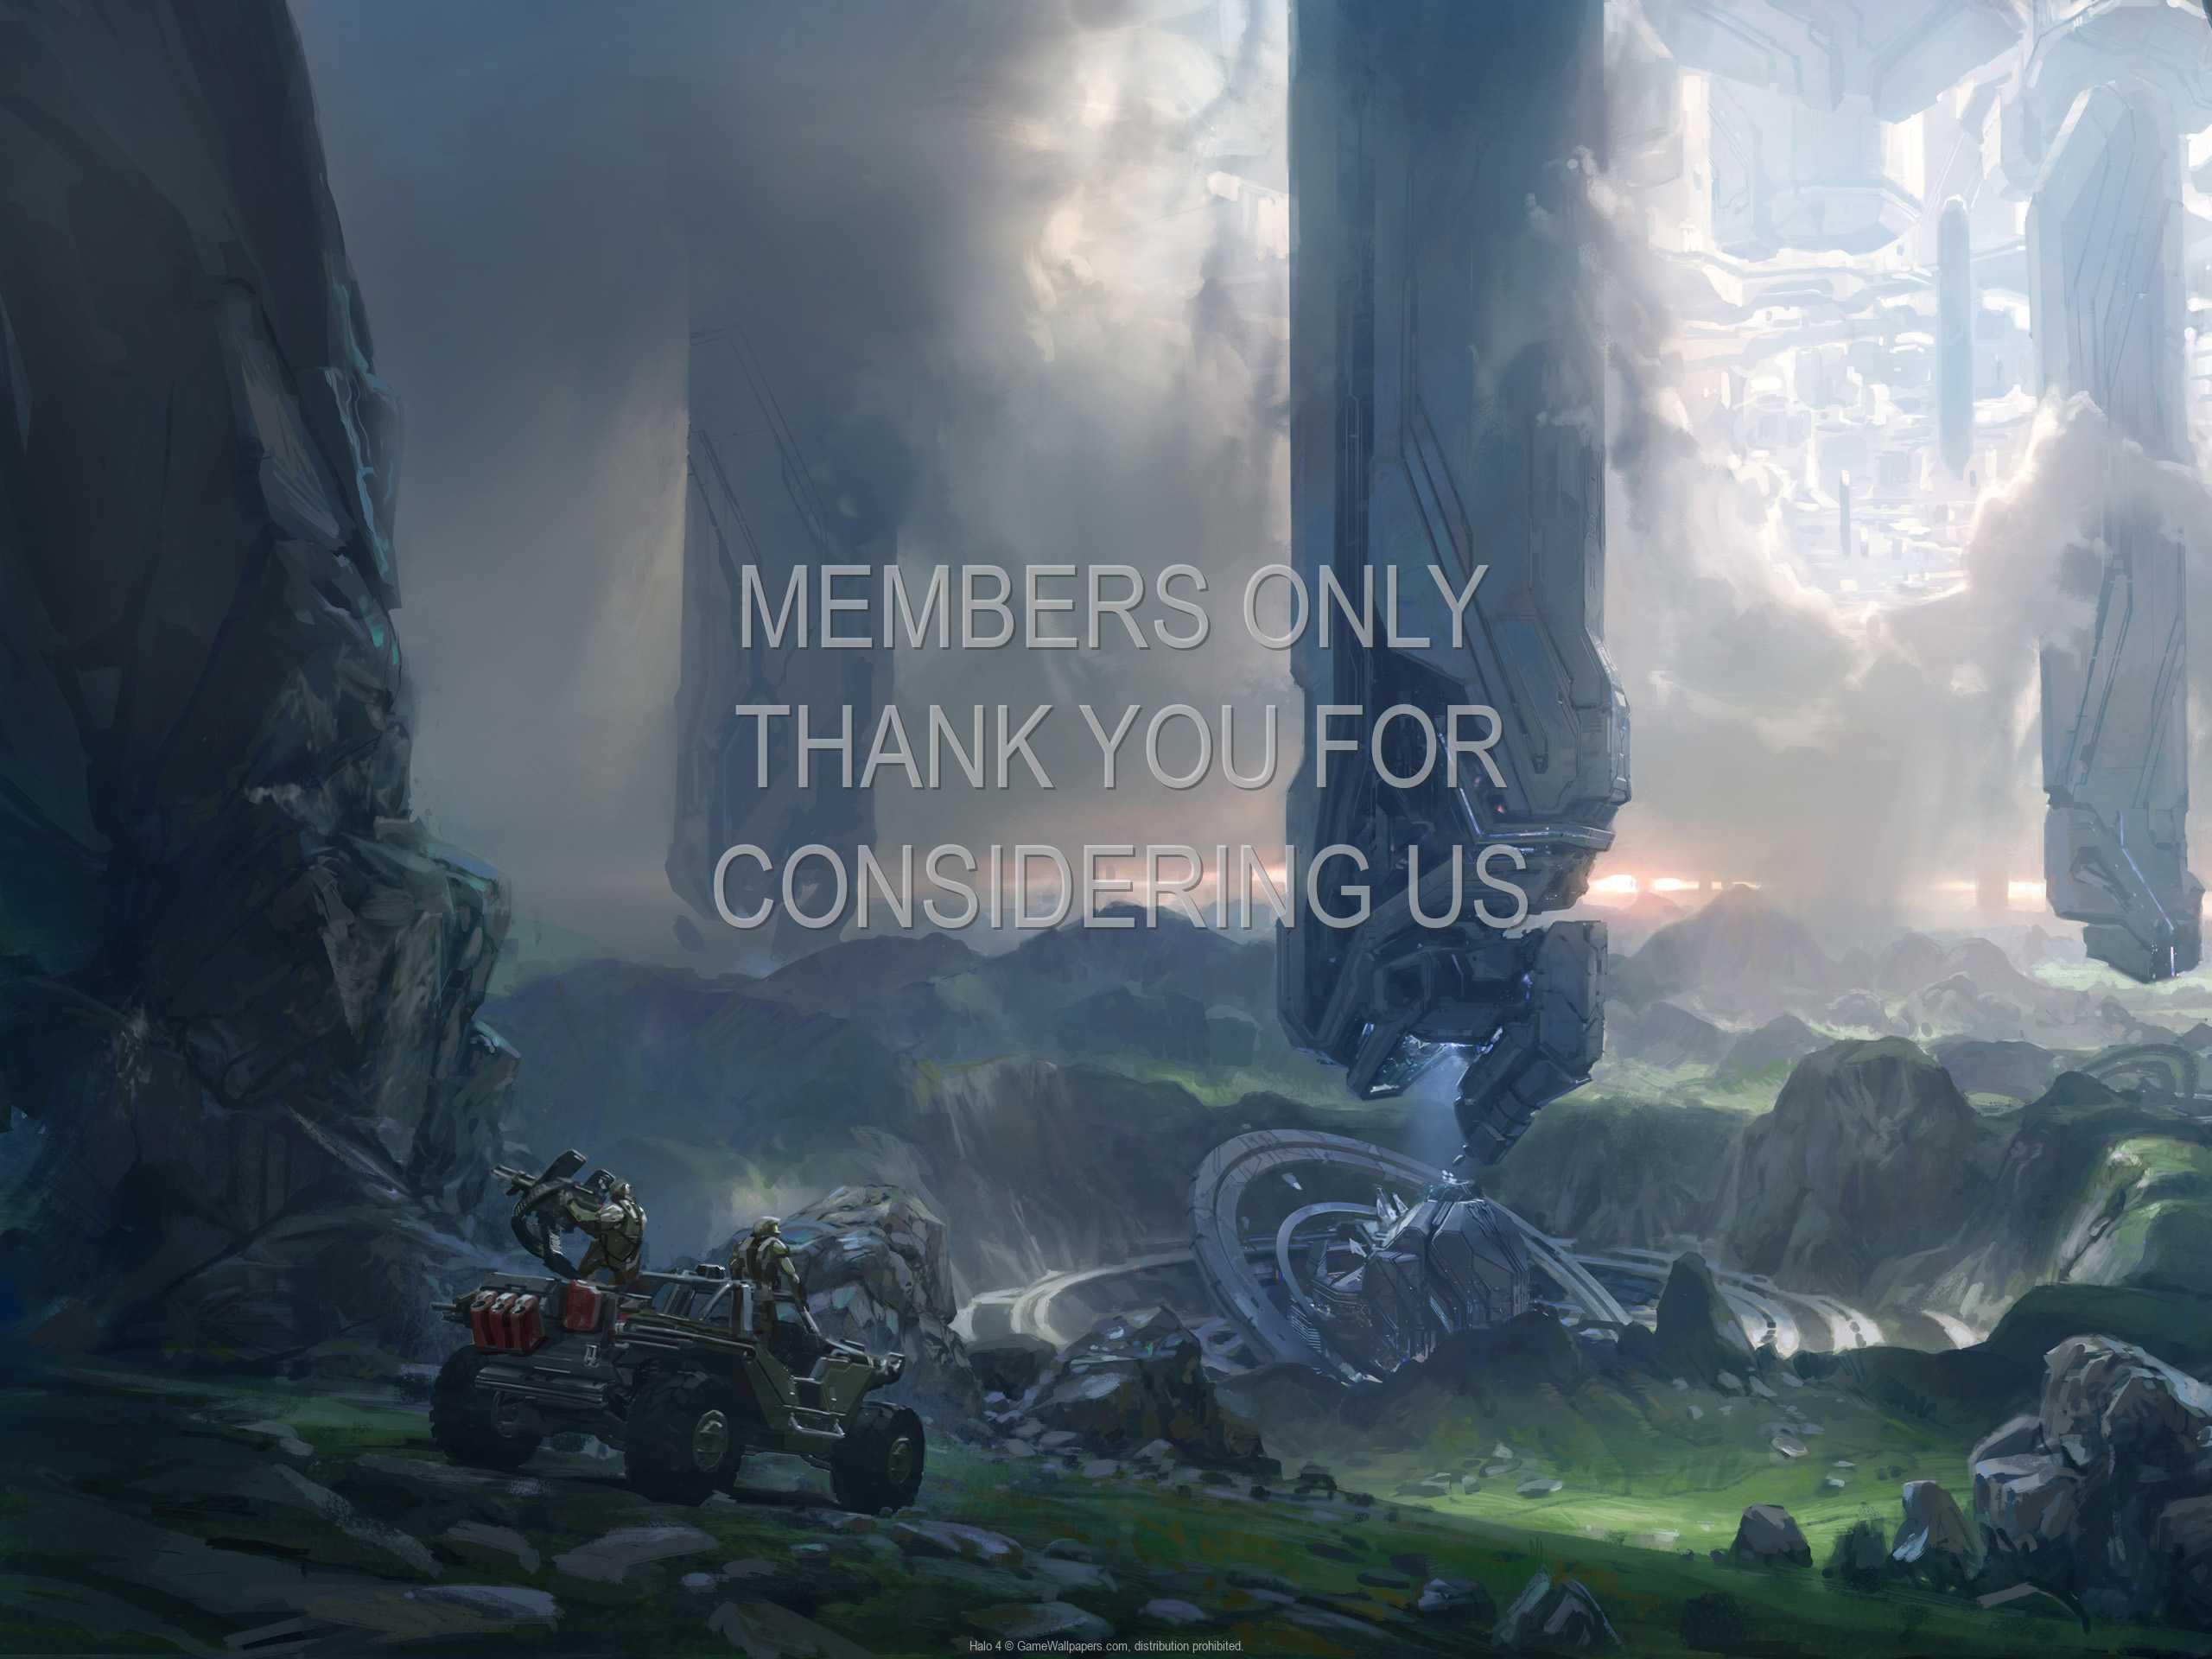 Halo 4 1080p Horizontal Handy Hintergrundbild 06